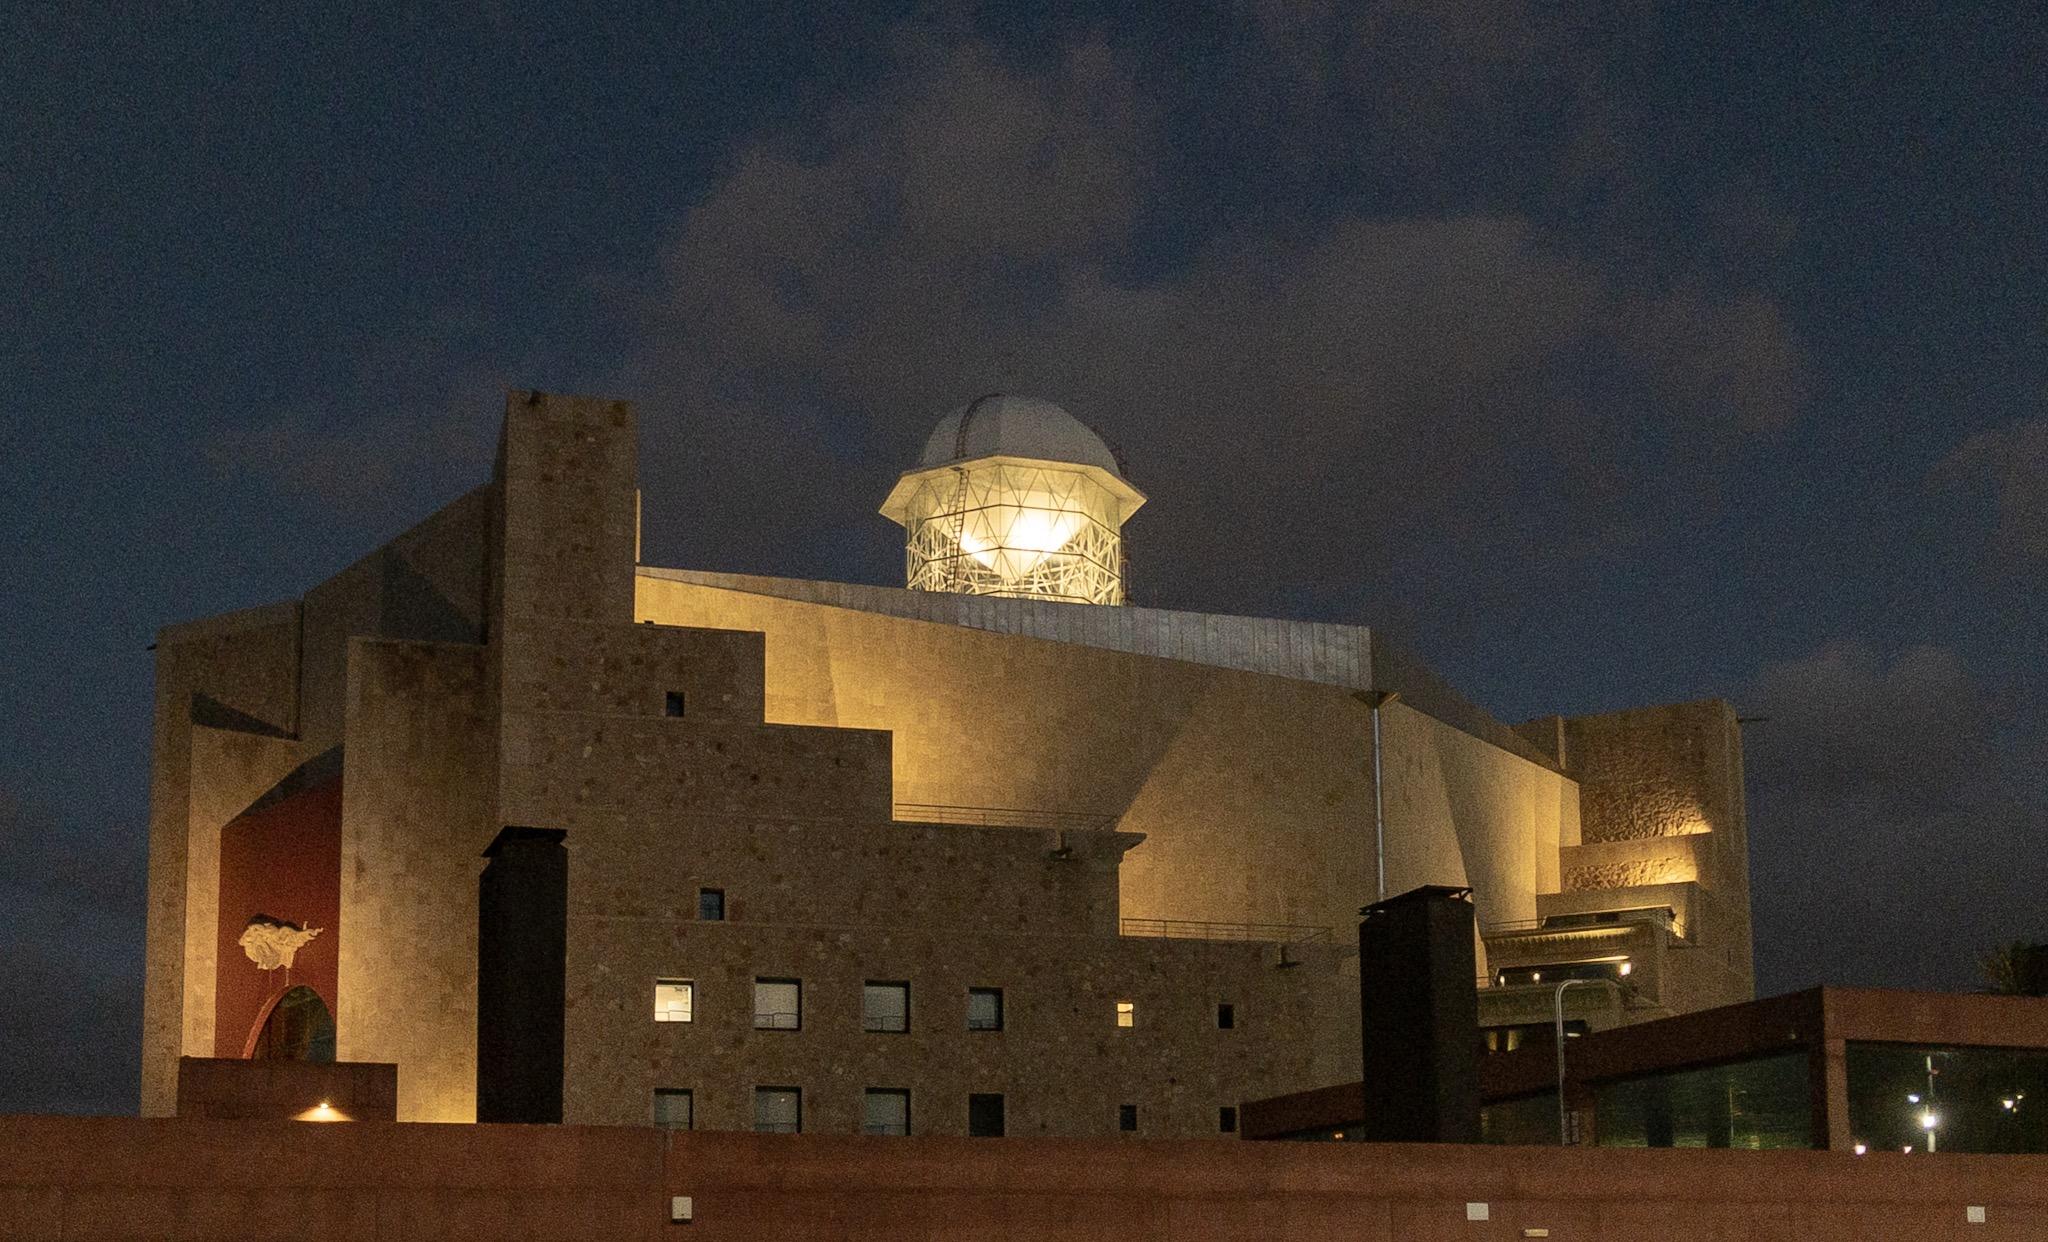 Alfredo Kraus Auditorium, Spain